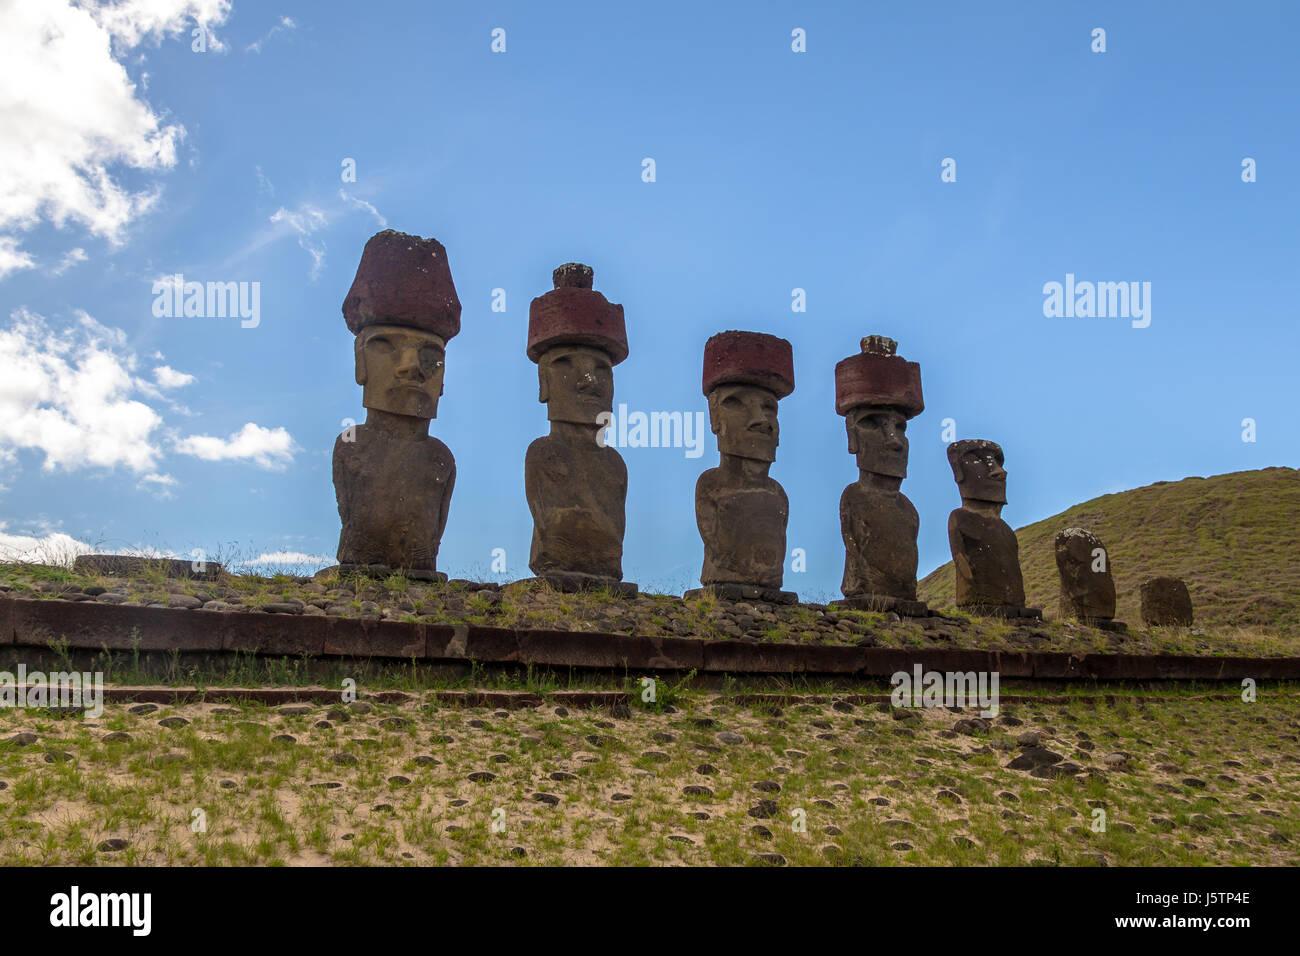 Moai Statues of Ahu Nau Nau wearing topknots near Anakena Beach - Easter Island, Chile - Stock Image